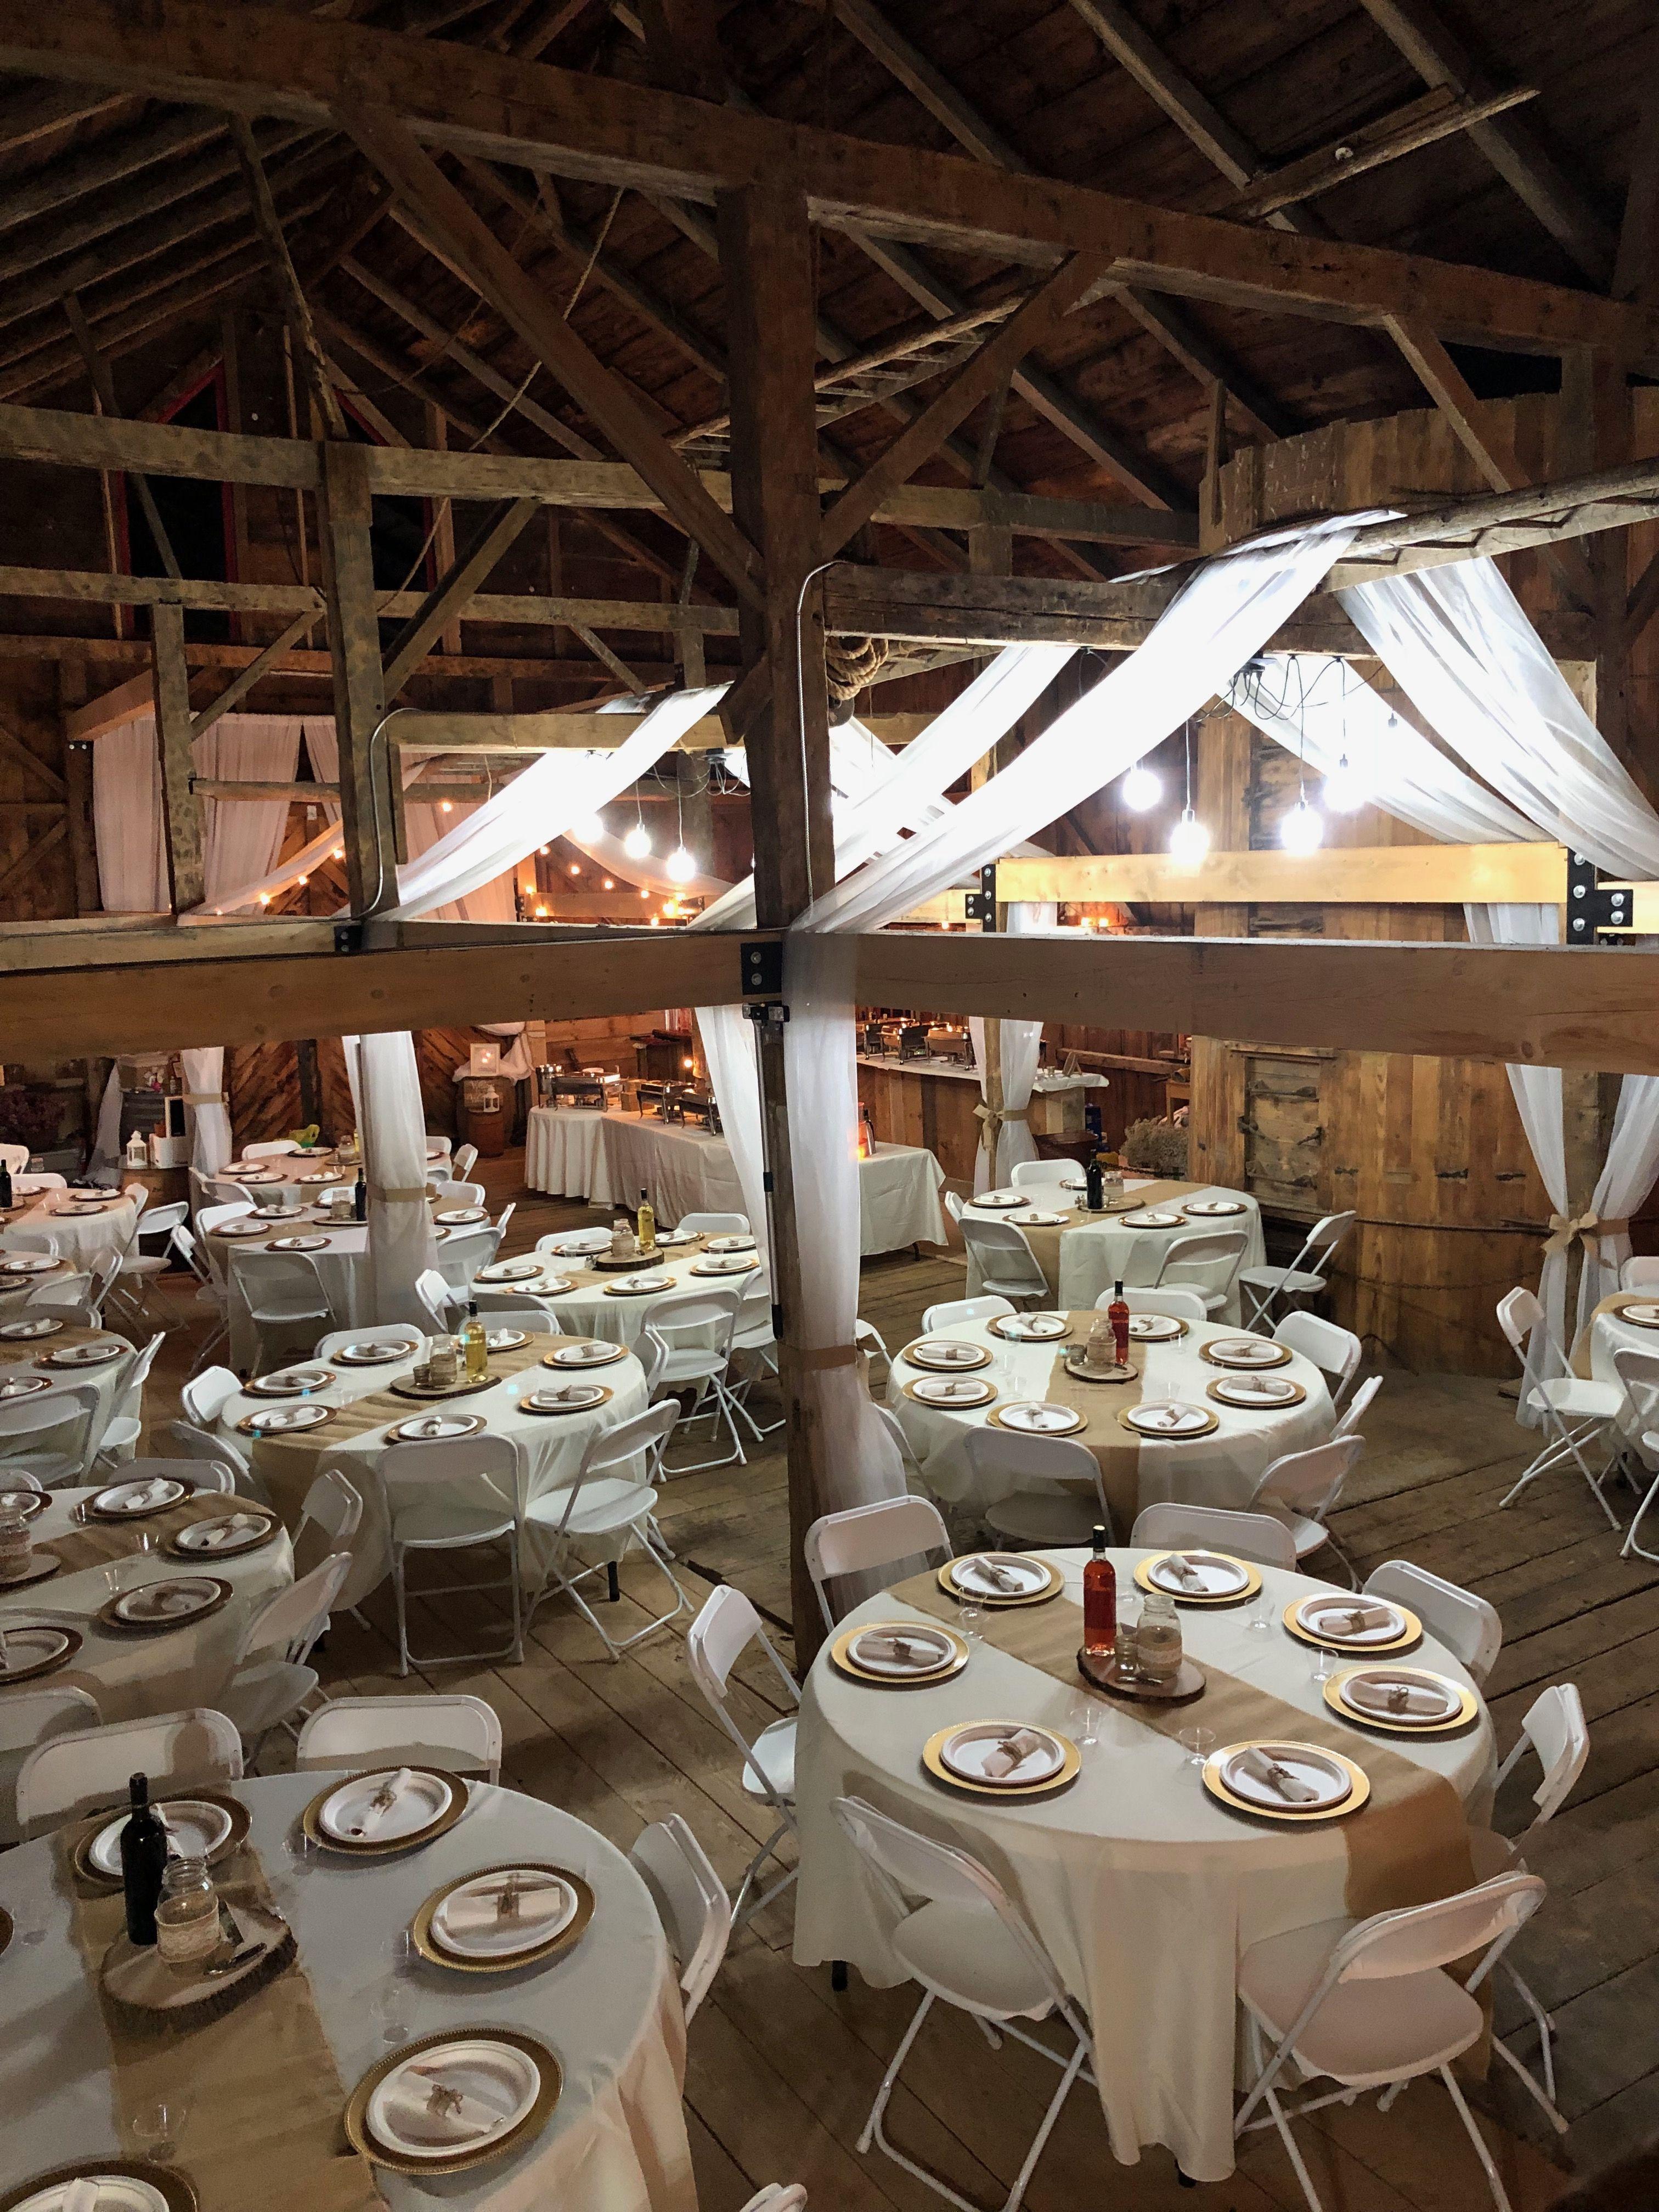 Barn wedding reception, white and burlap linens white ...